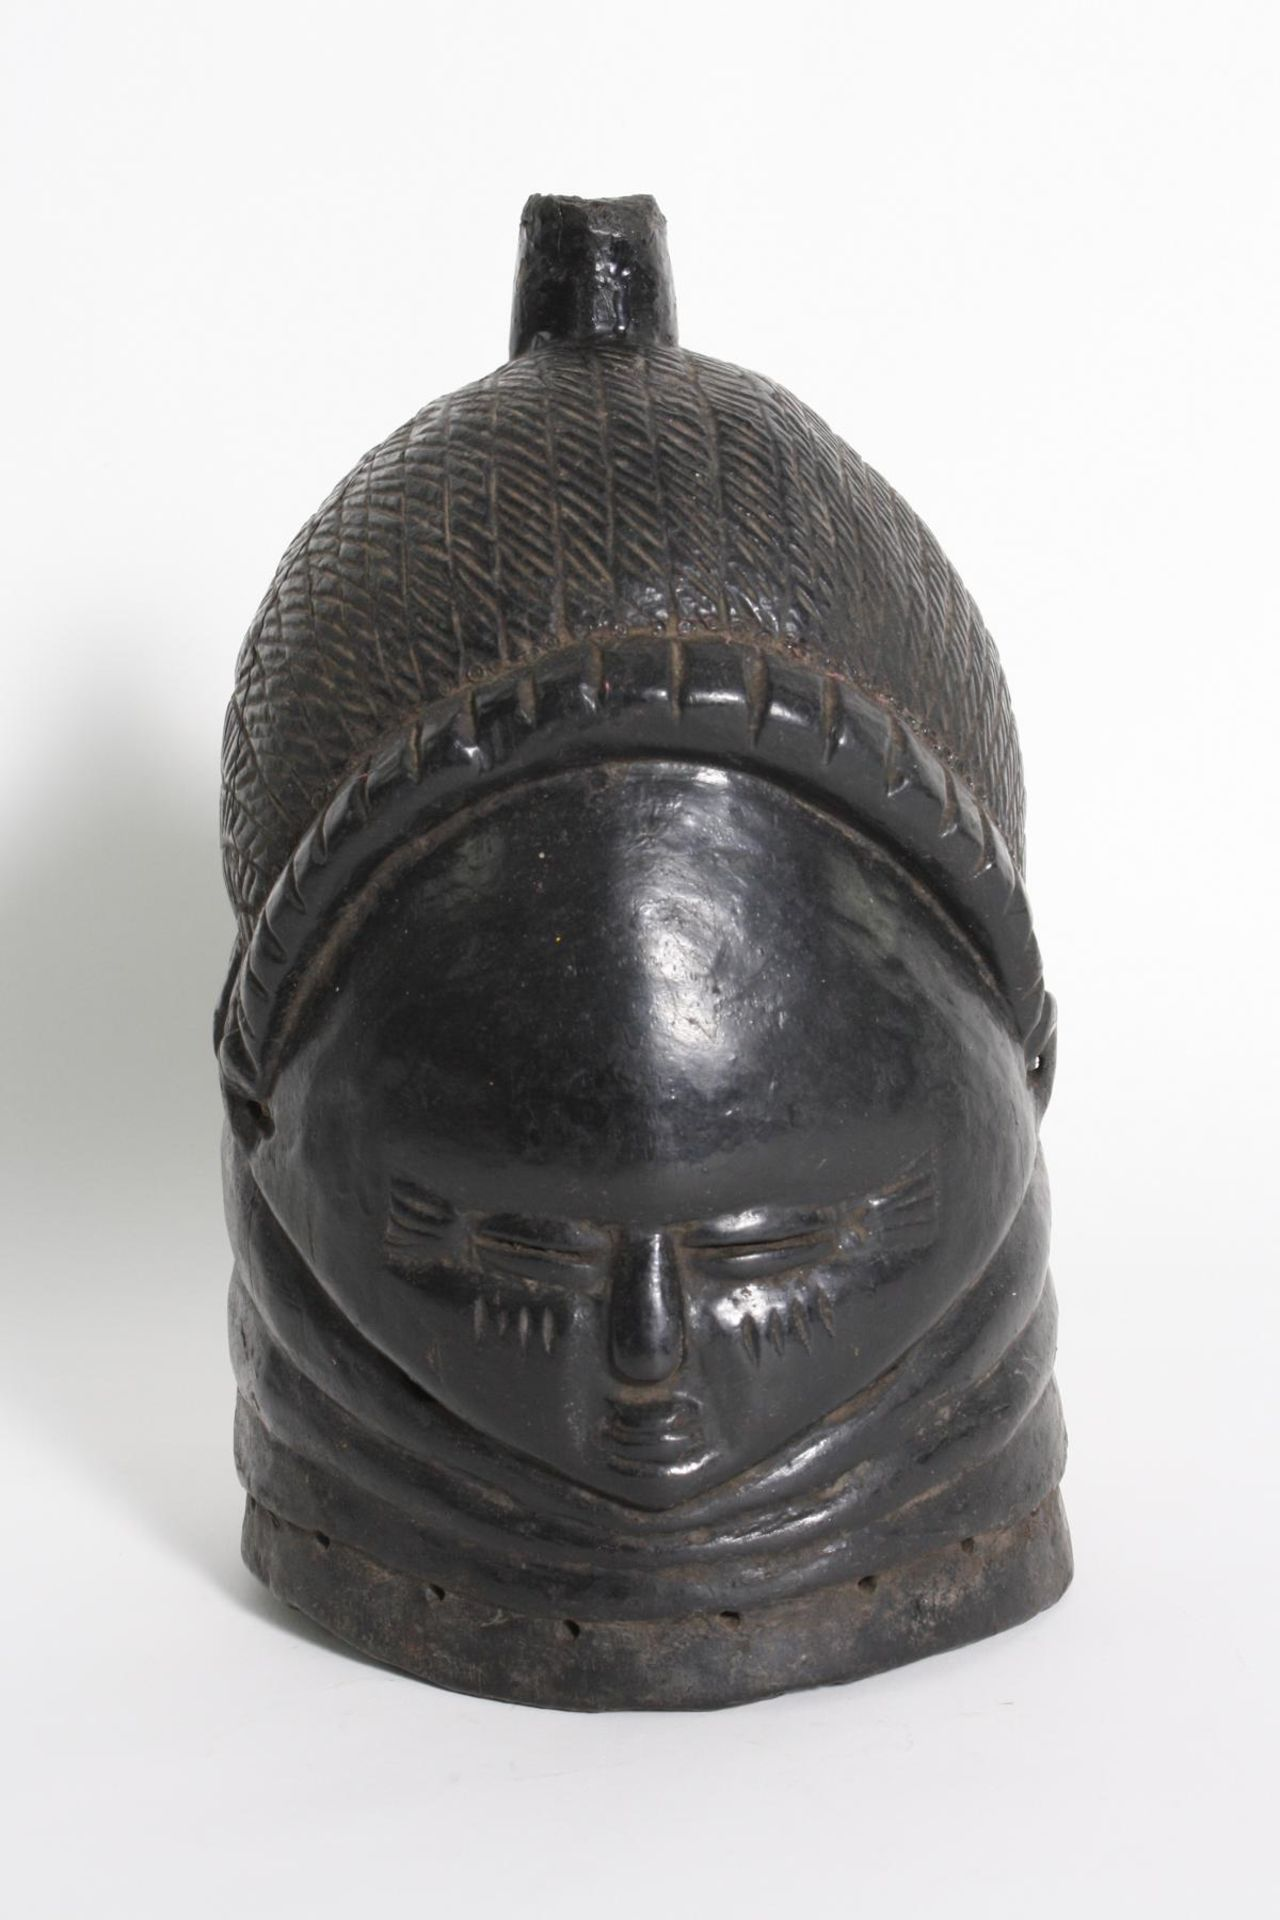 Sowei-Maske, Sandé-Gesellschaft, Mende, Sierra Leone, 1. Hälfte 20. Jh.